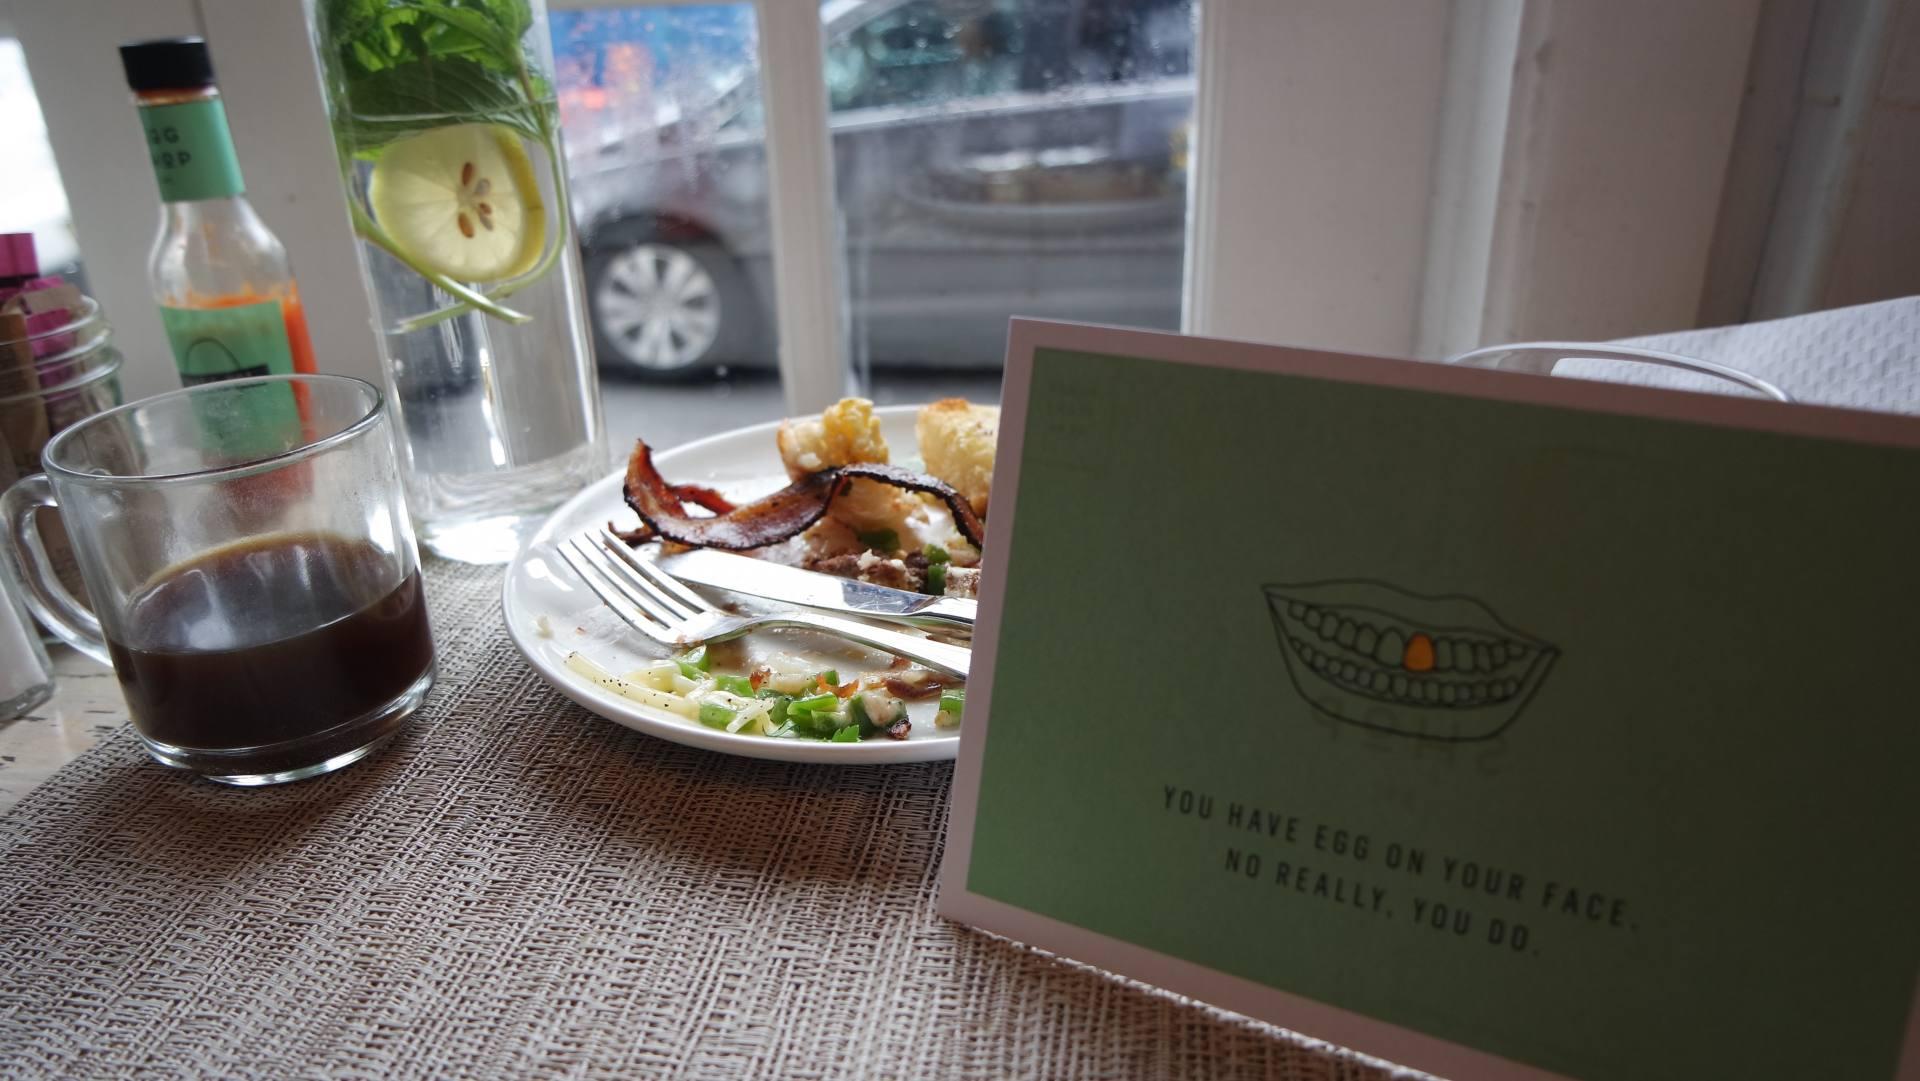 egg-shop-nyc-food-postcard